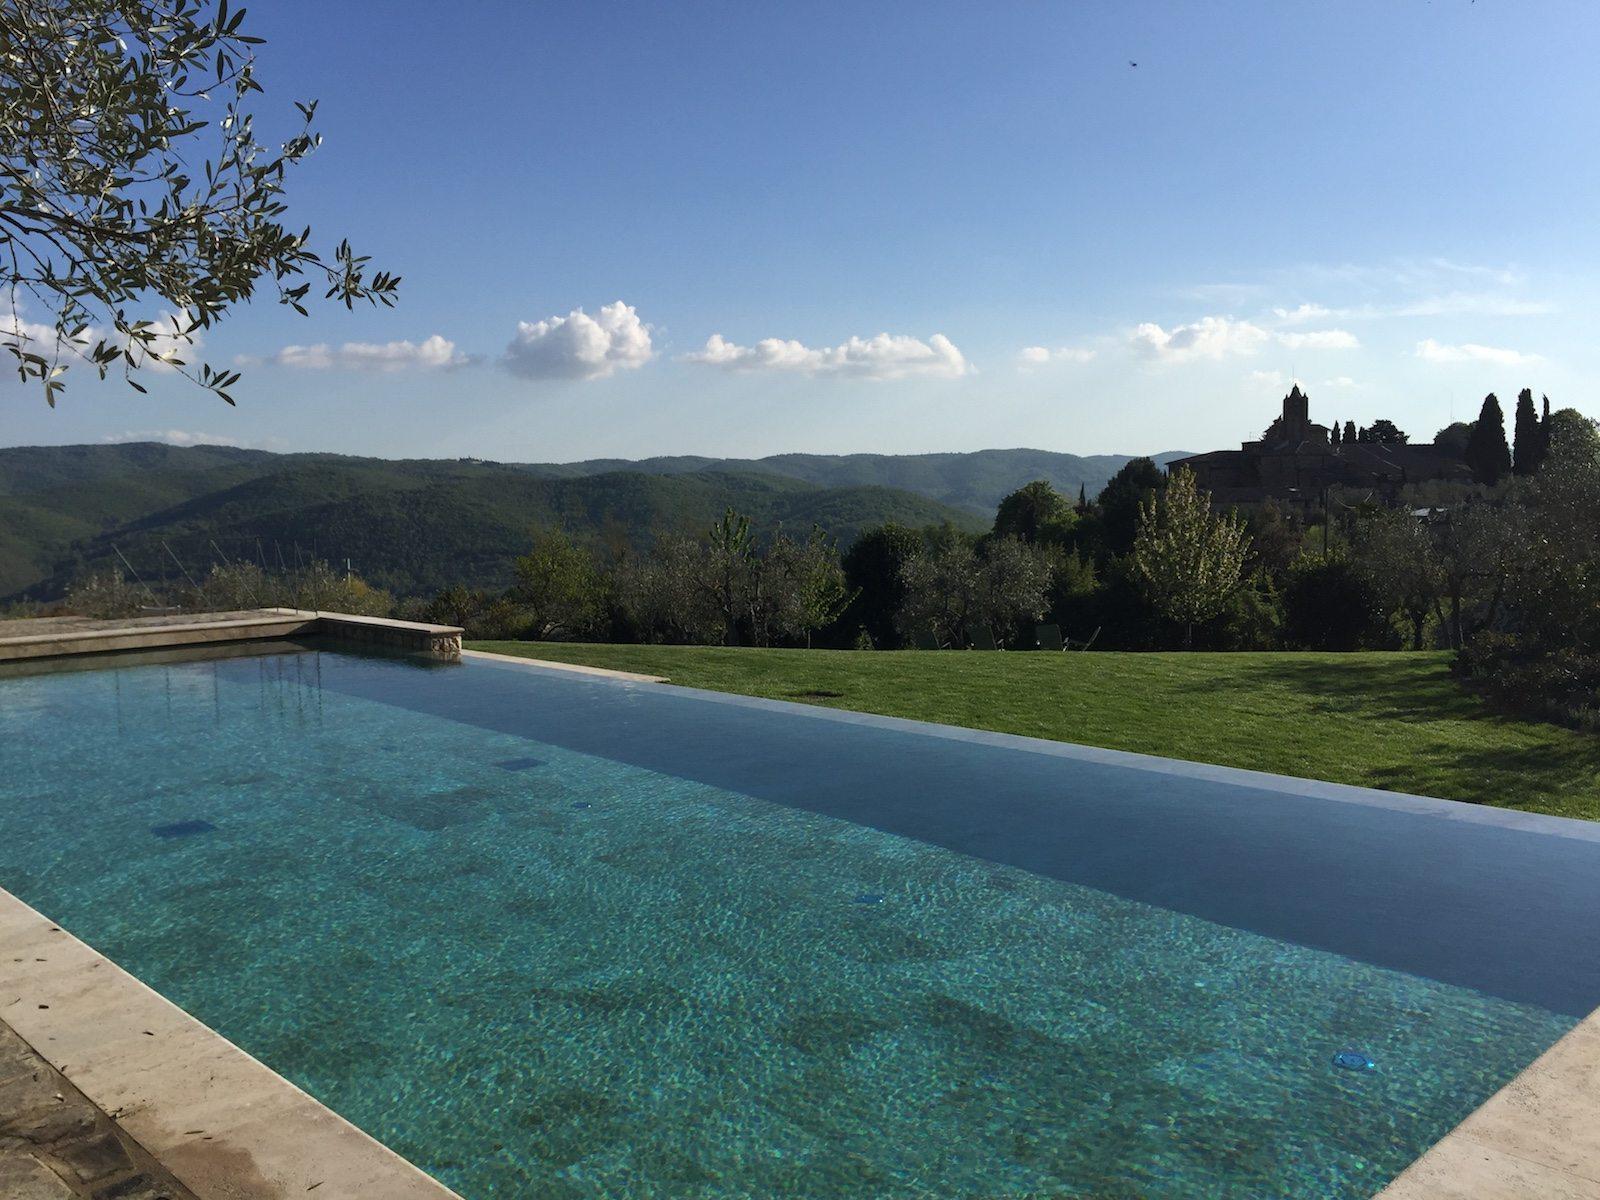 Villa le barone italy infinity pools - Infinity pool europe ...